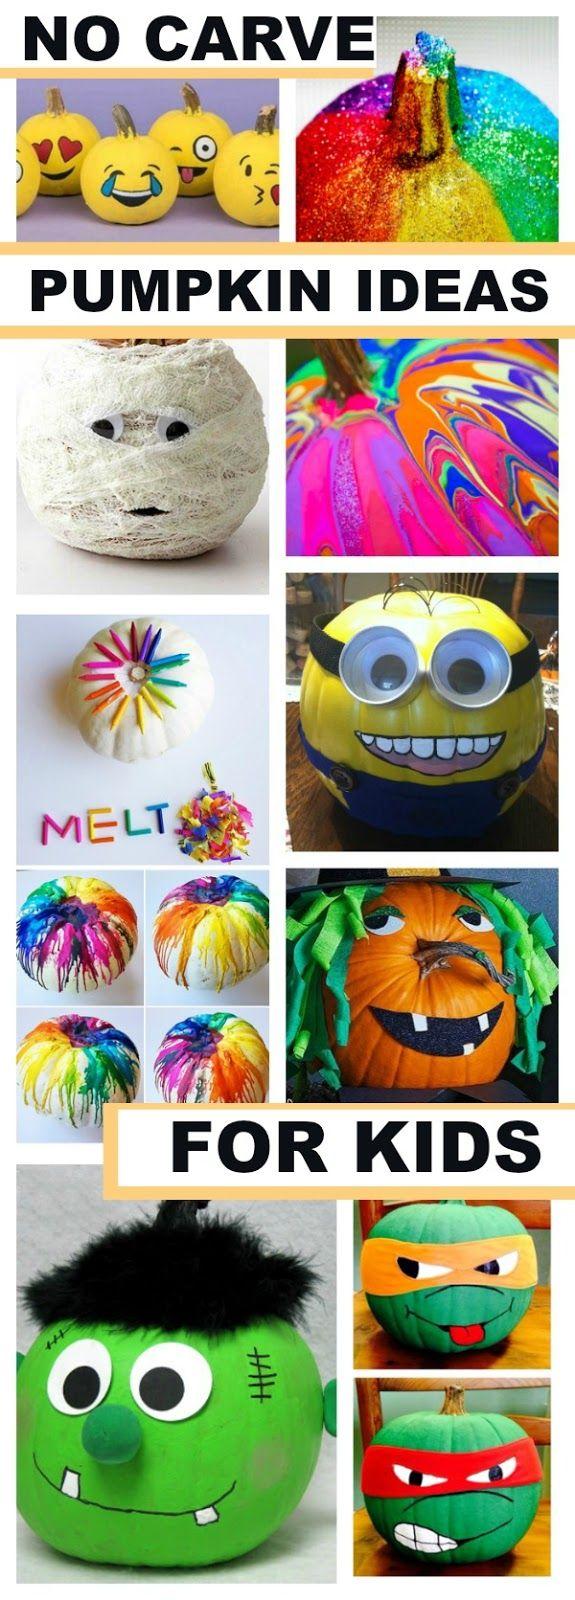 And fashion magic halloween pumpkins carving and decorating ideas - And Fashion Magic Halloween Pumpkins Carving And Decorating Ideas 25 No Carve Pumpkin Decorating Ideas Download